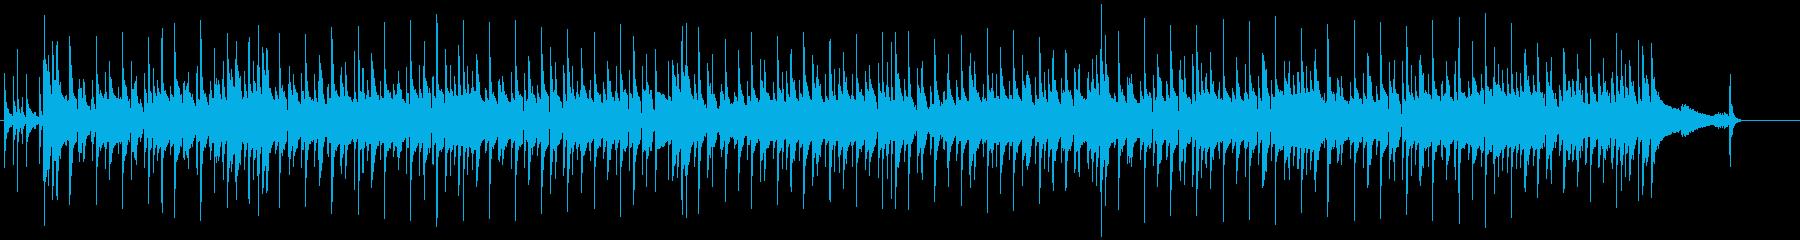 Youtube向け日常BGMの再生済みの波形